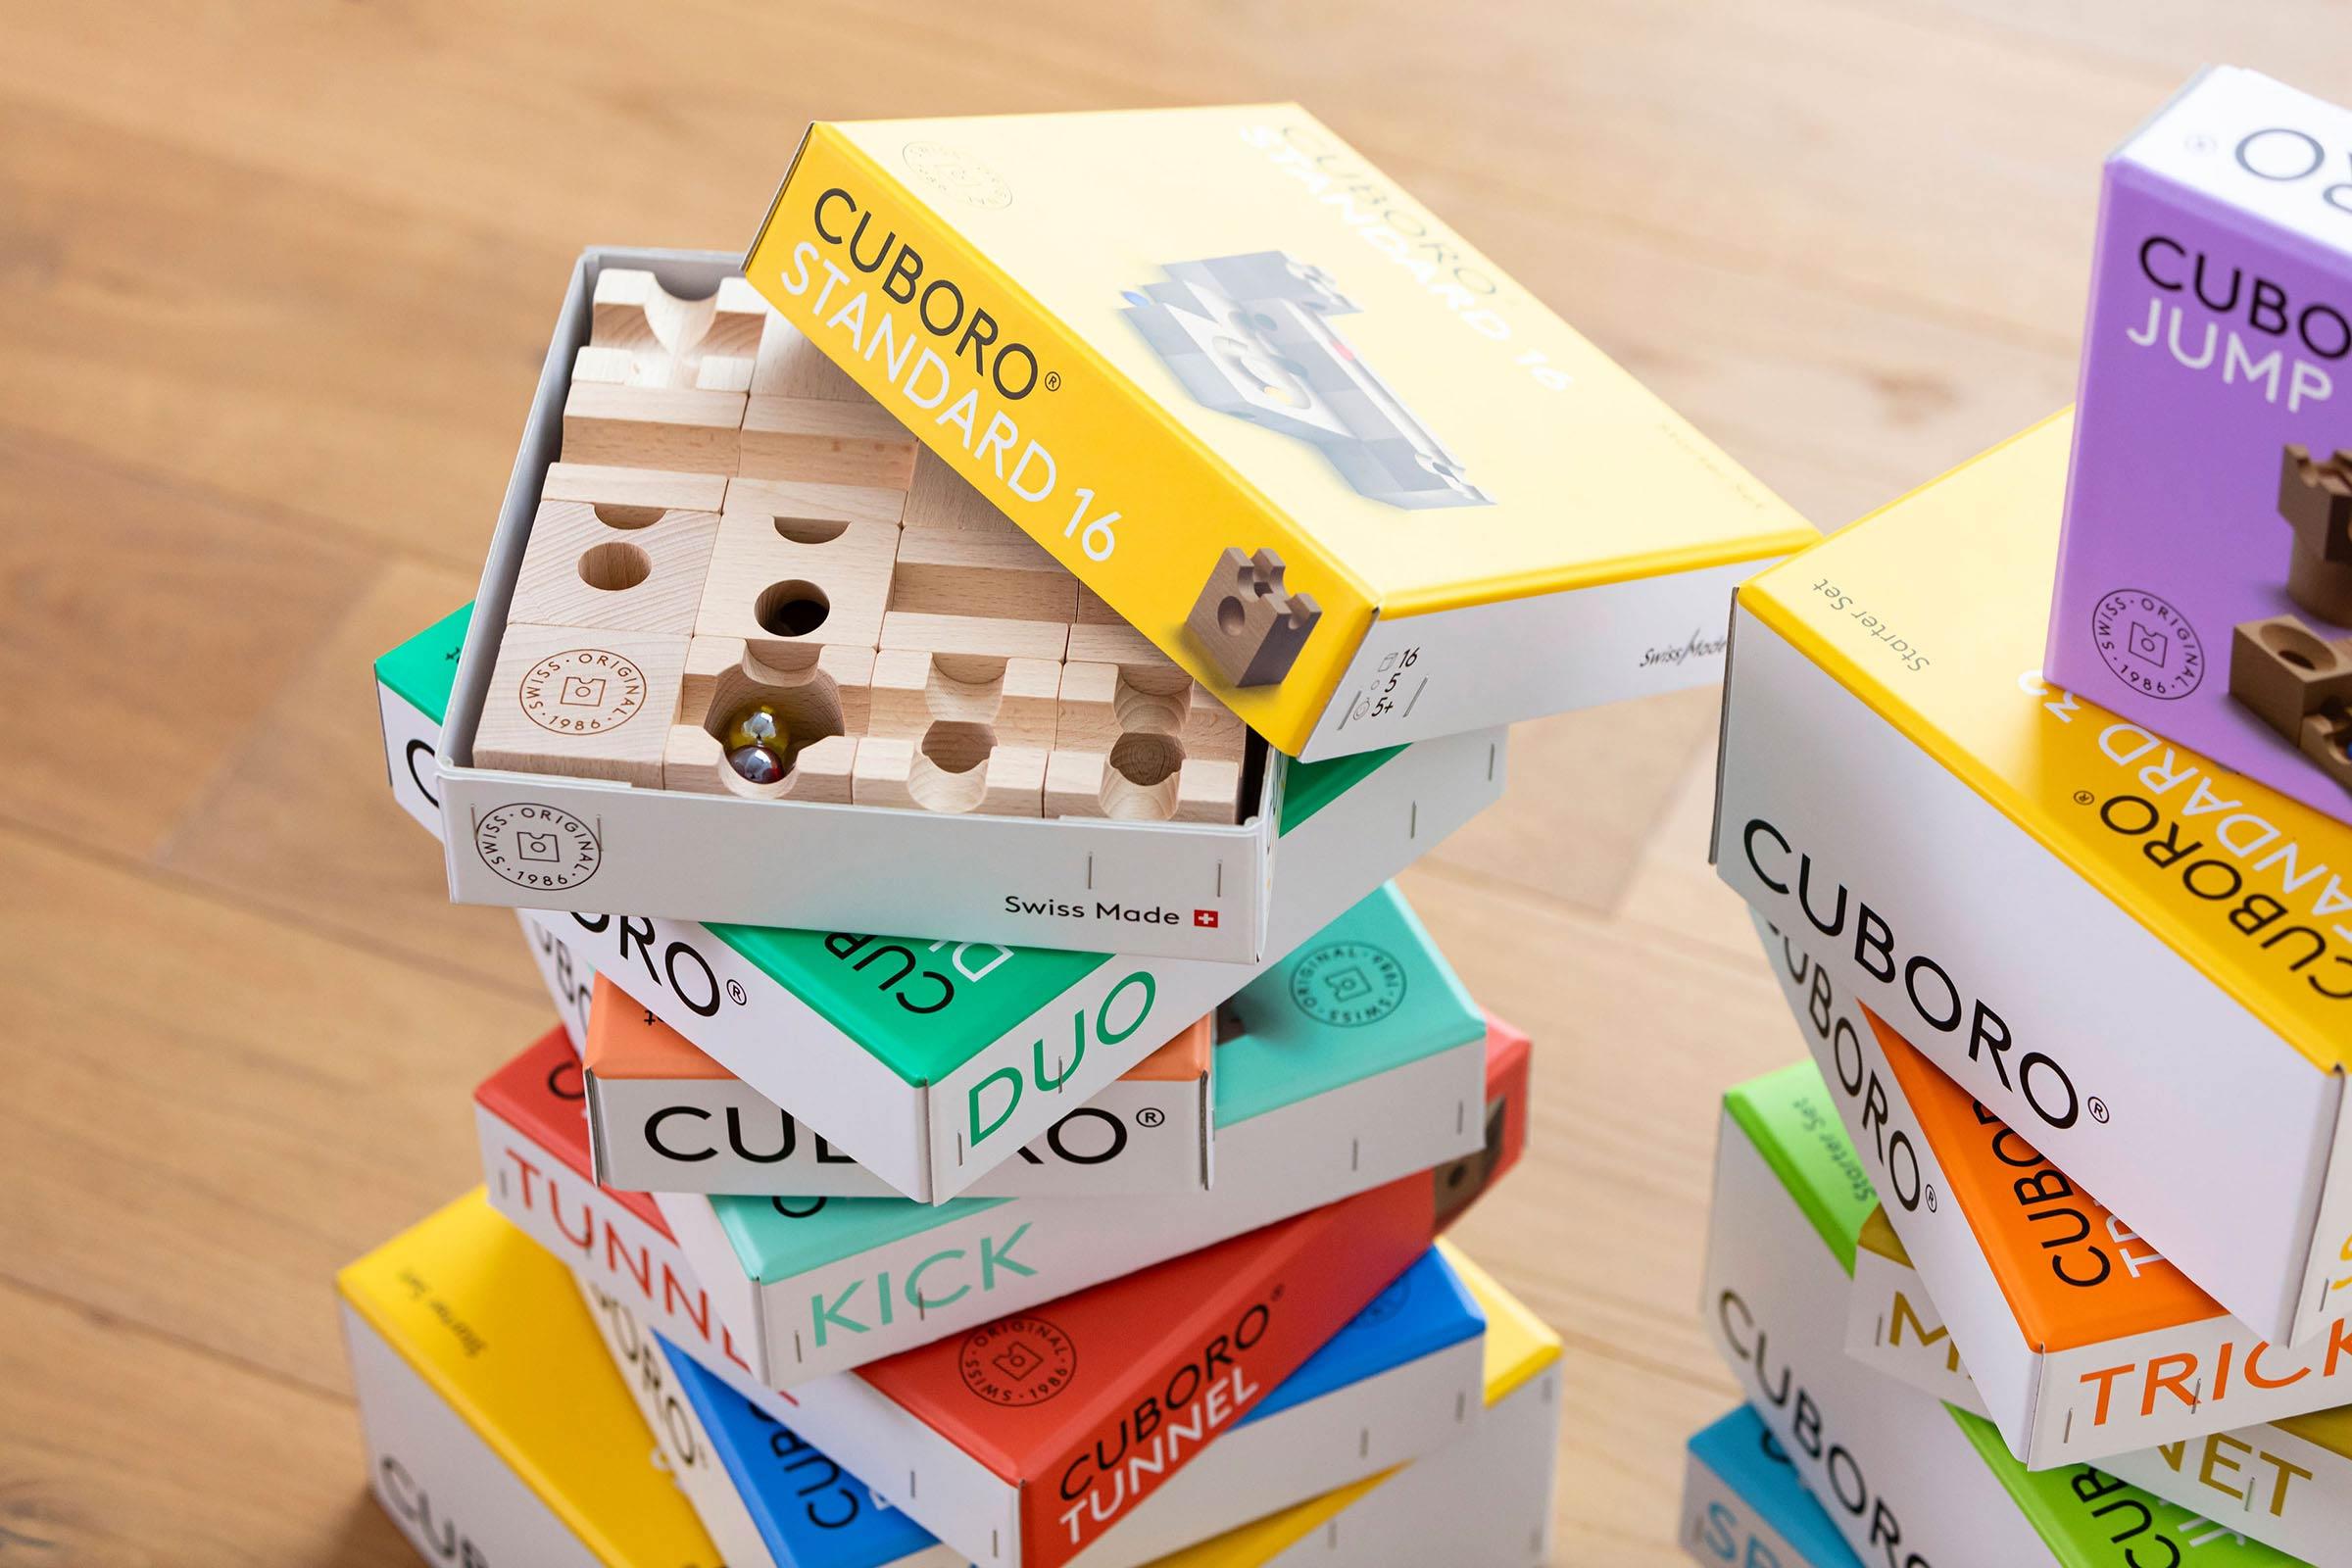 CUBORO Sets Swiss Made Design Holz Kugelbahn